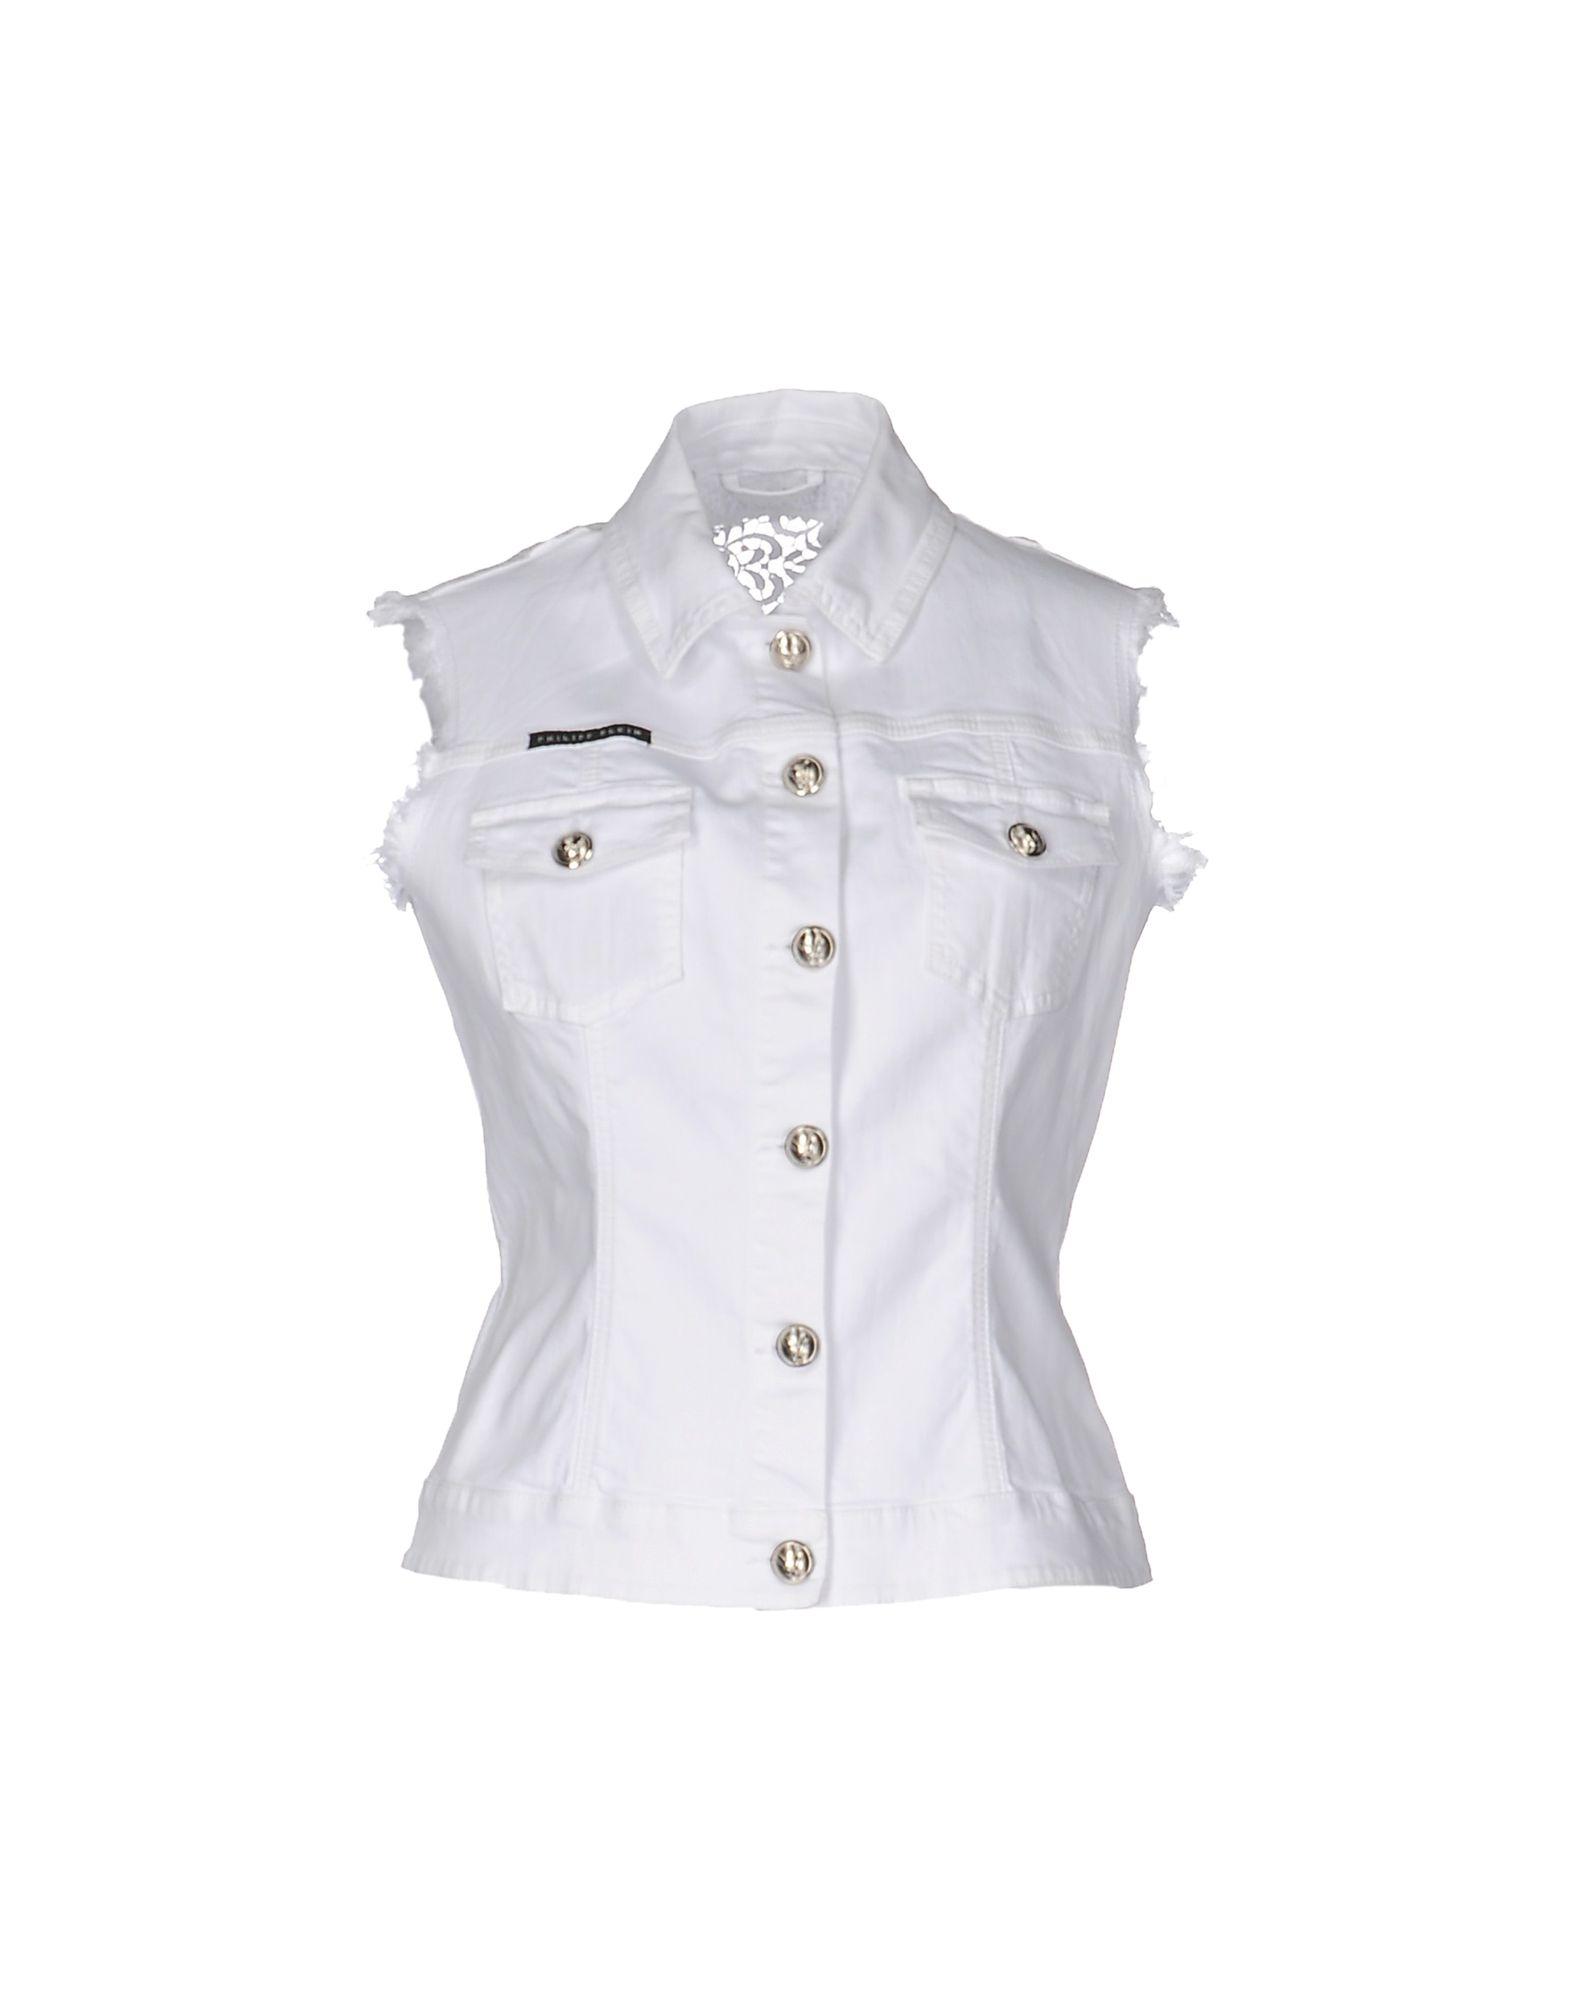 PHILIPP PLEIN Джинсовая верхняя одежда colmar джинсовая верхняя одежда